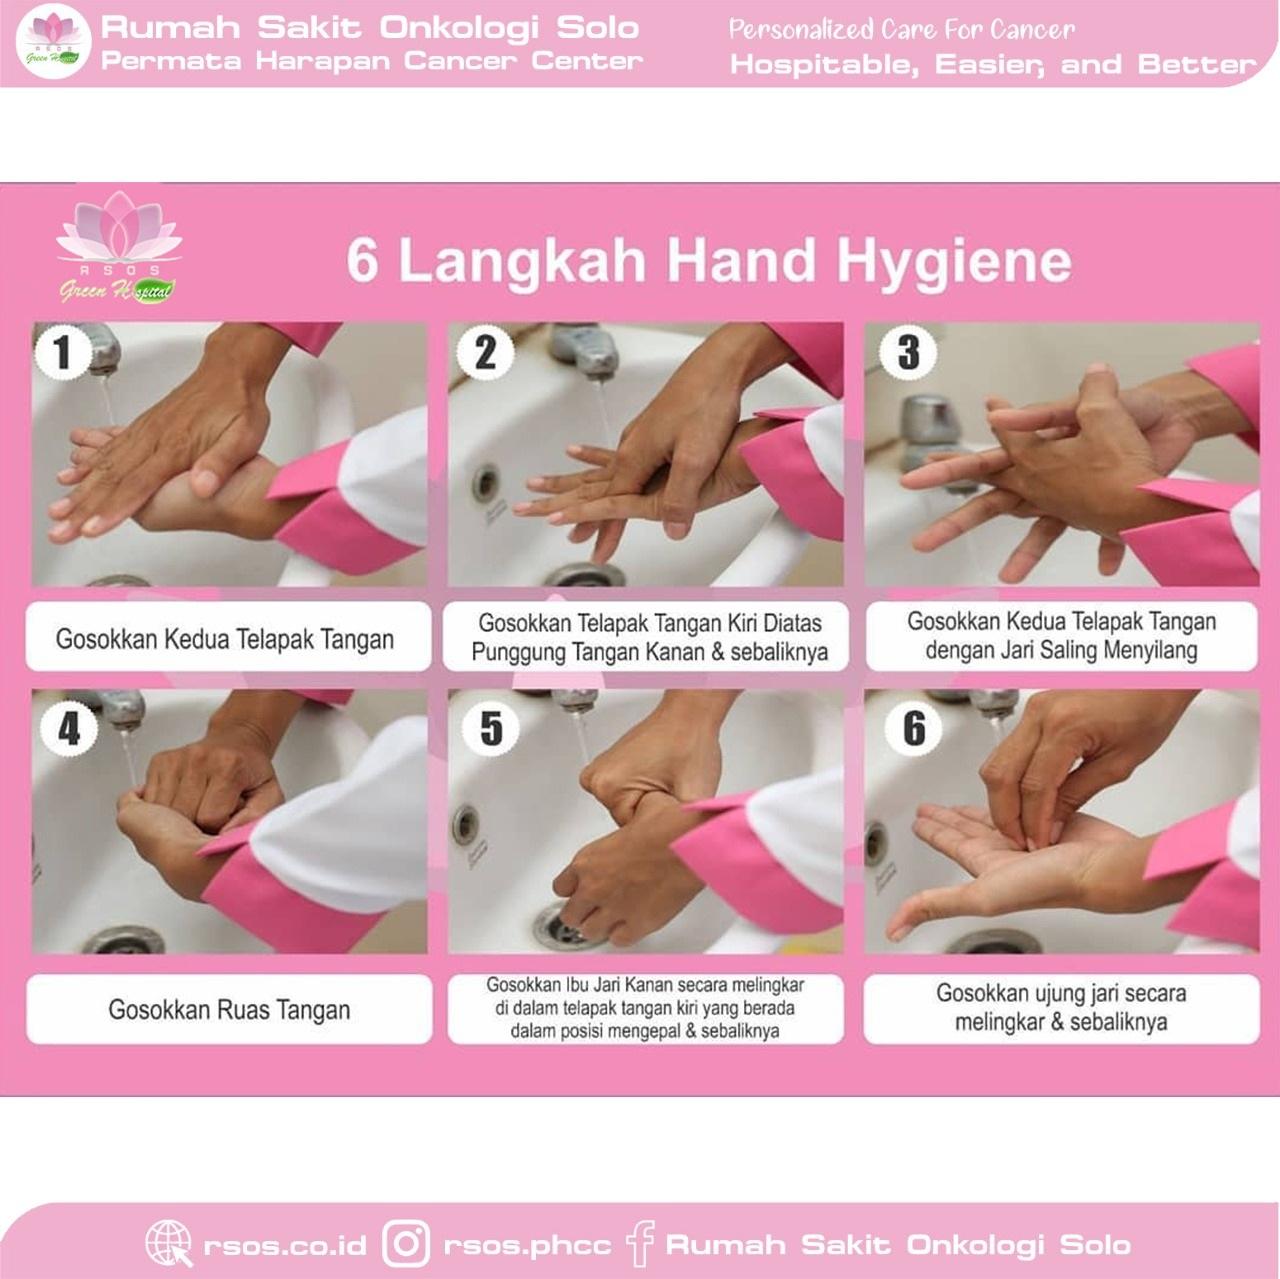 Langkah Hand Hygiene